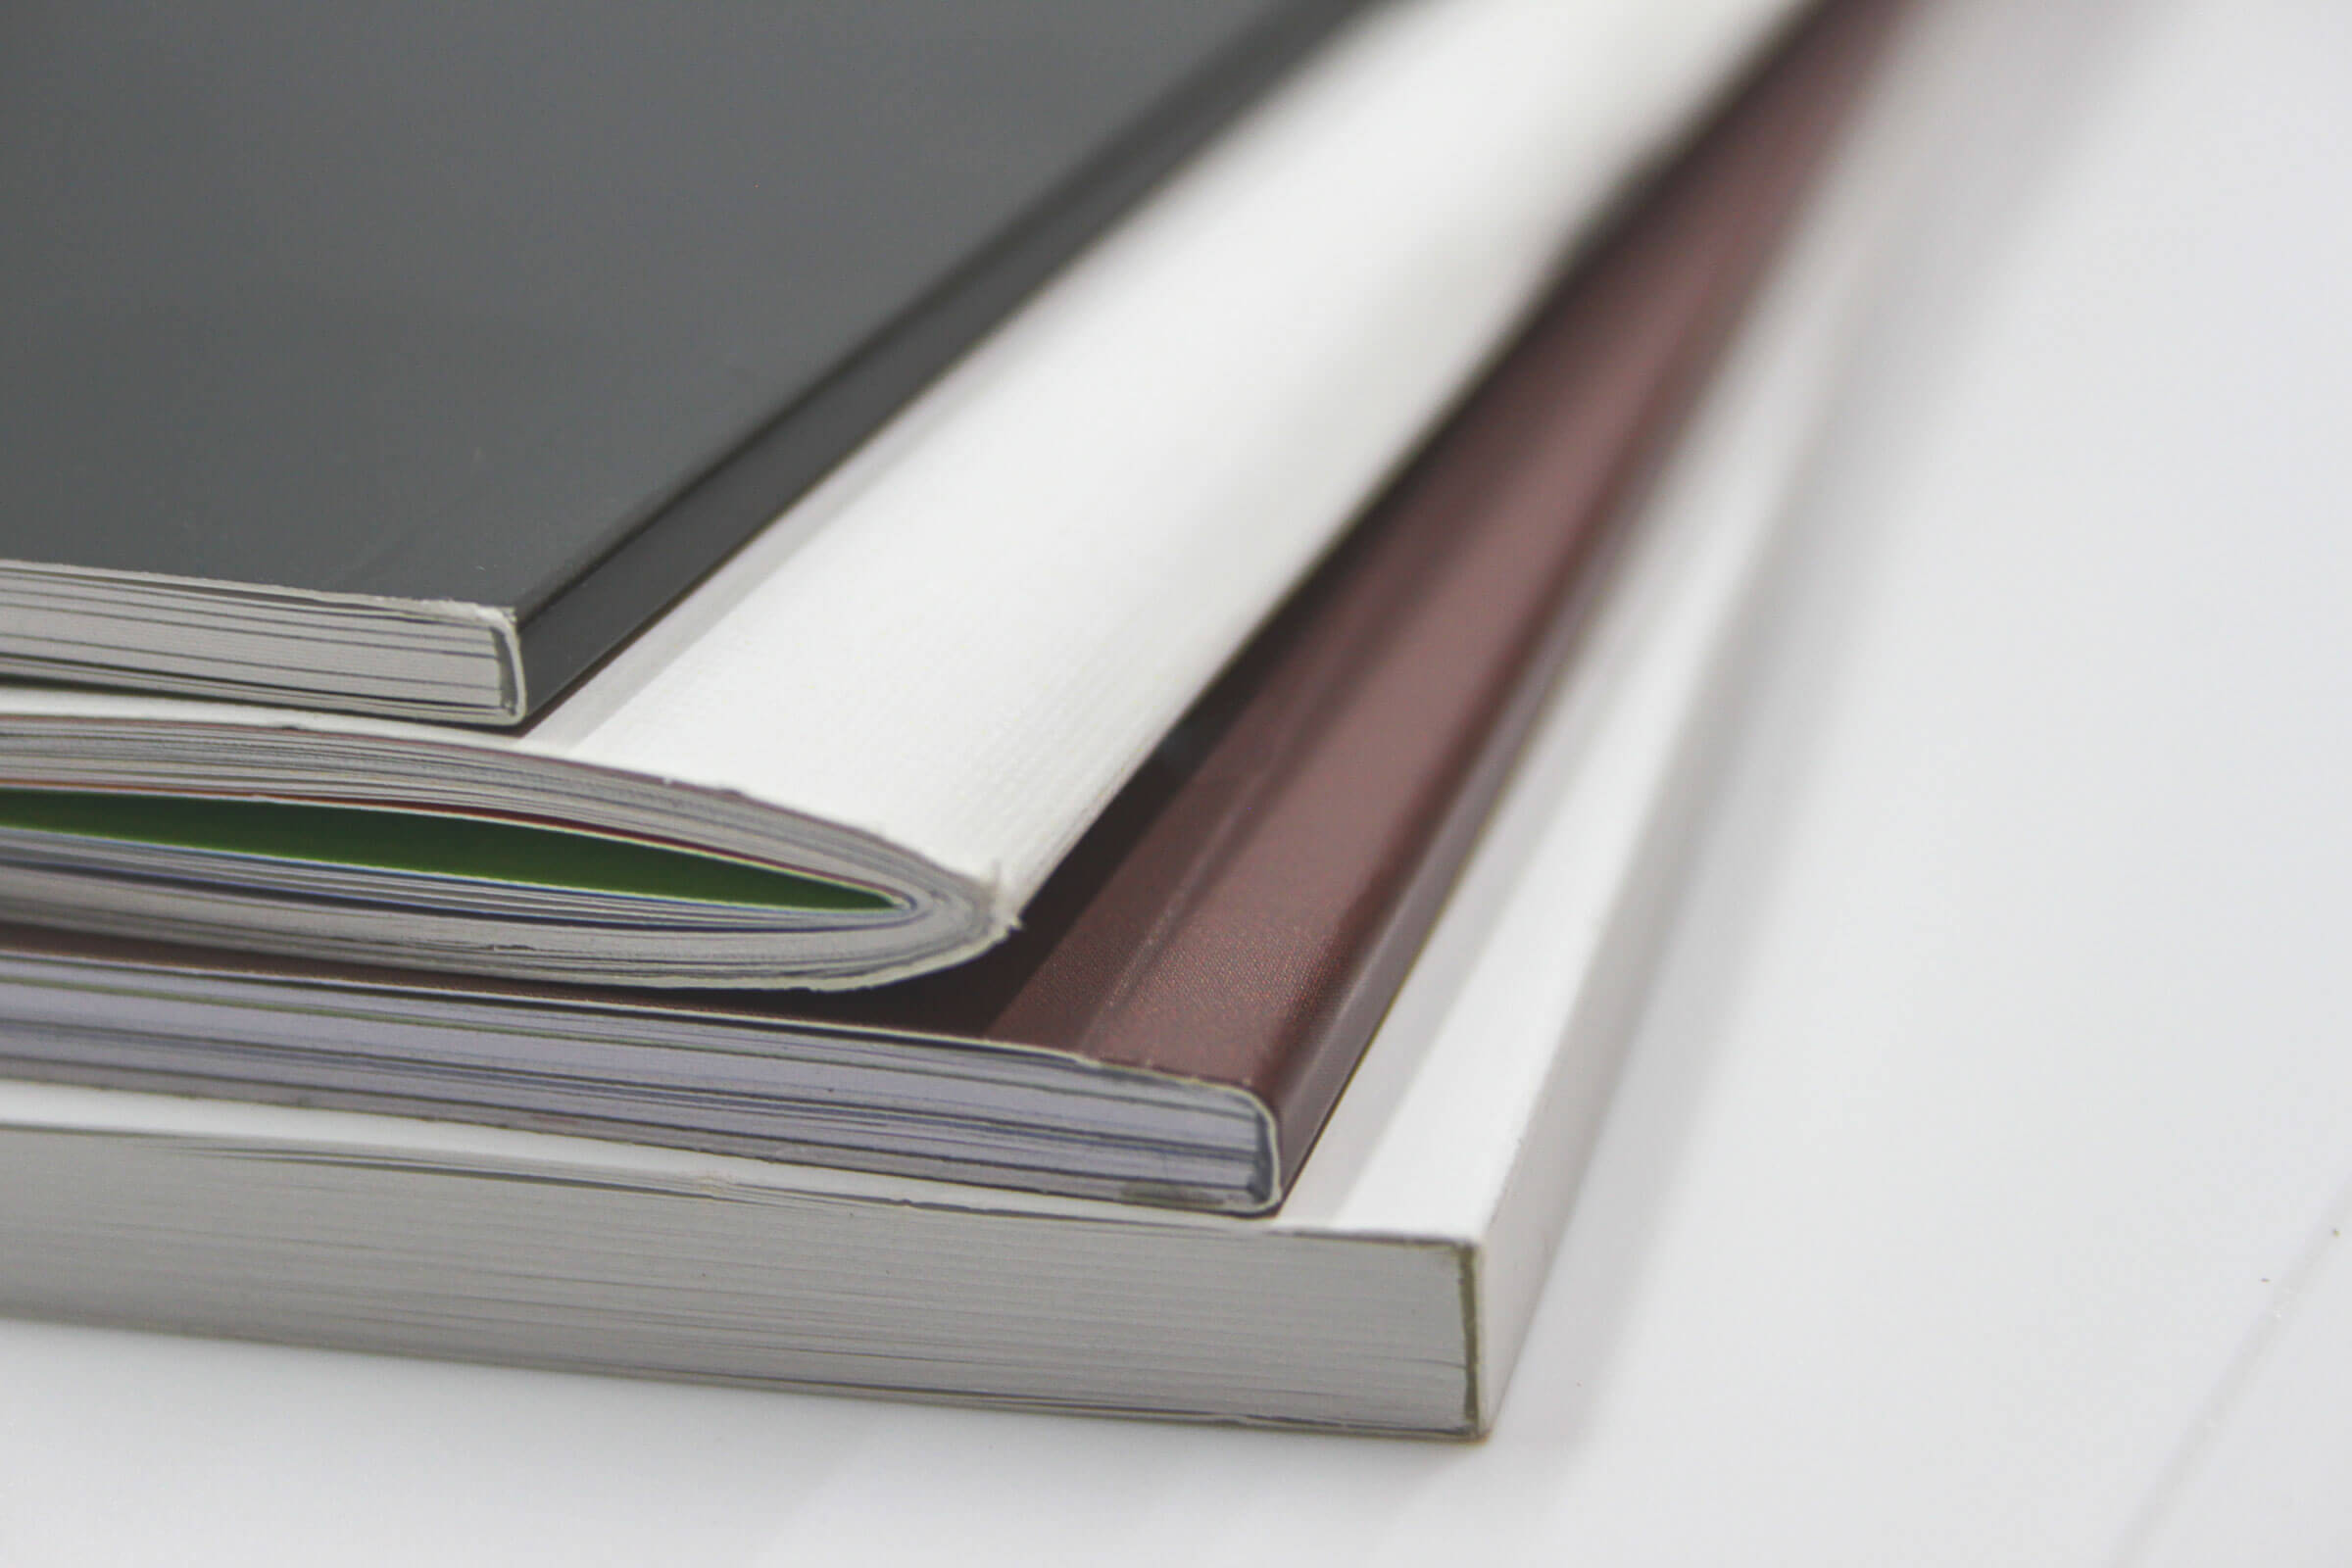 Broschüre, Vereinsheft, Zeitschrift, Geschäftsbericht